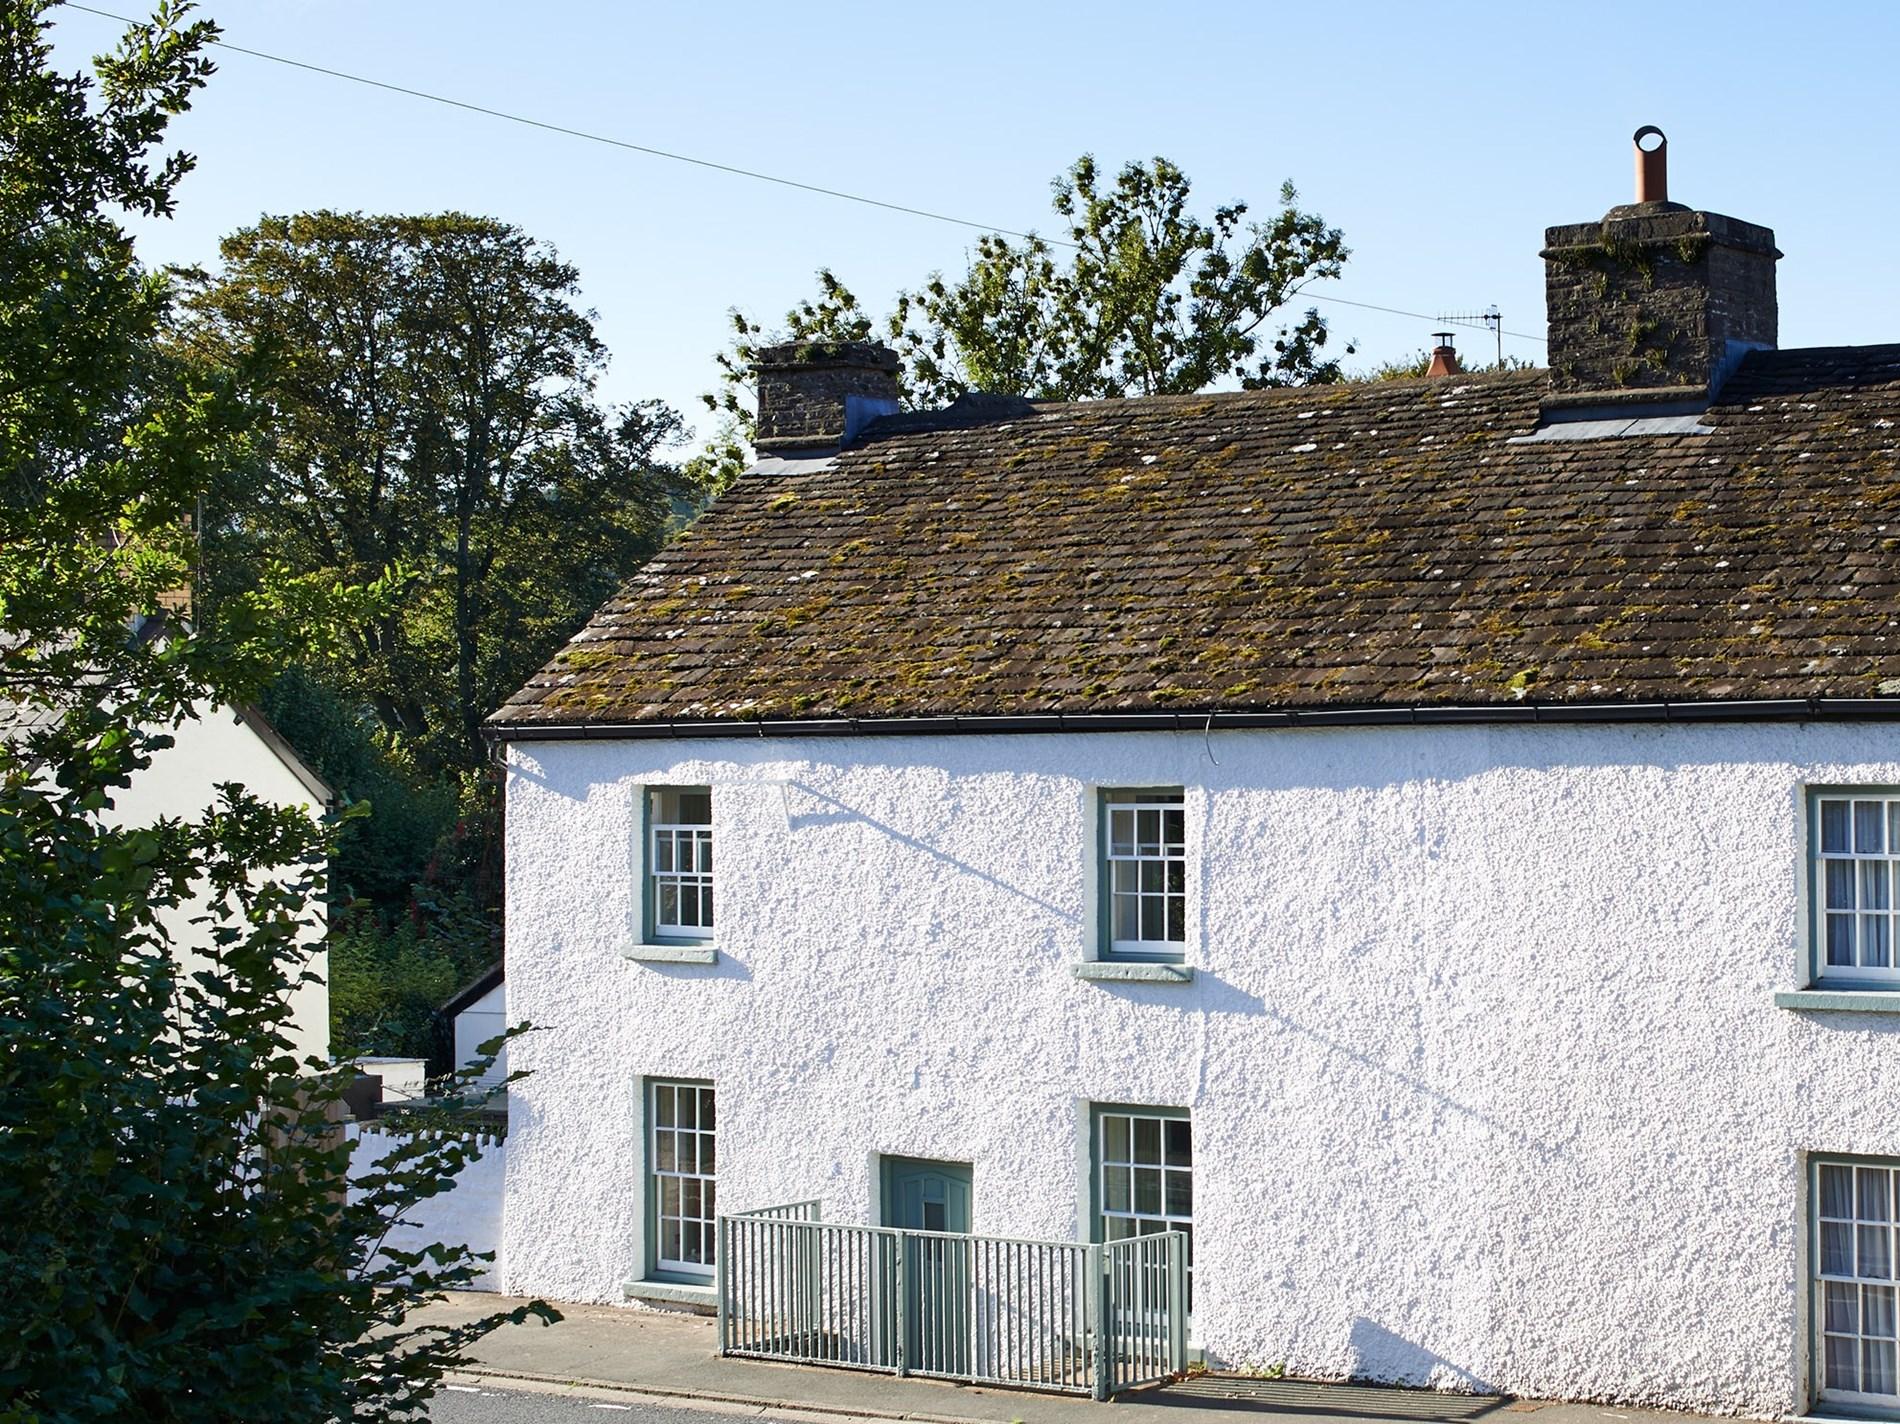 2 Bedroom Cottage in Crickhowell, Mid Wales